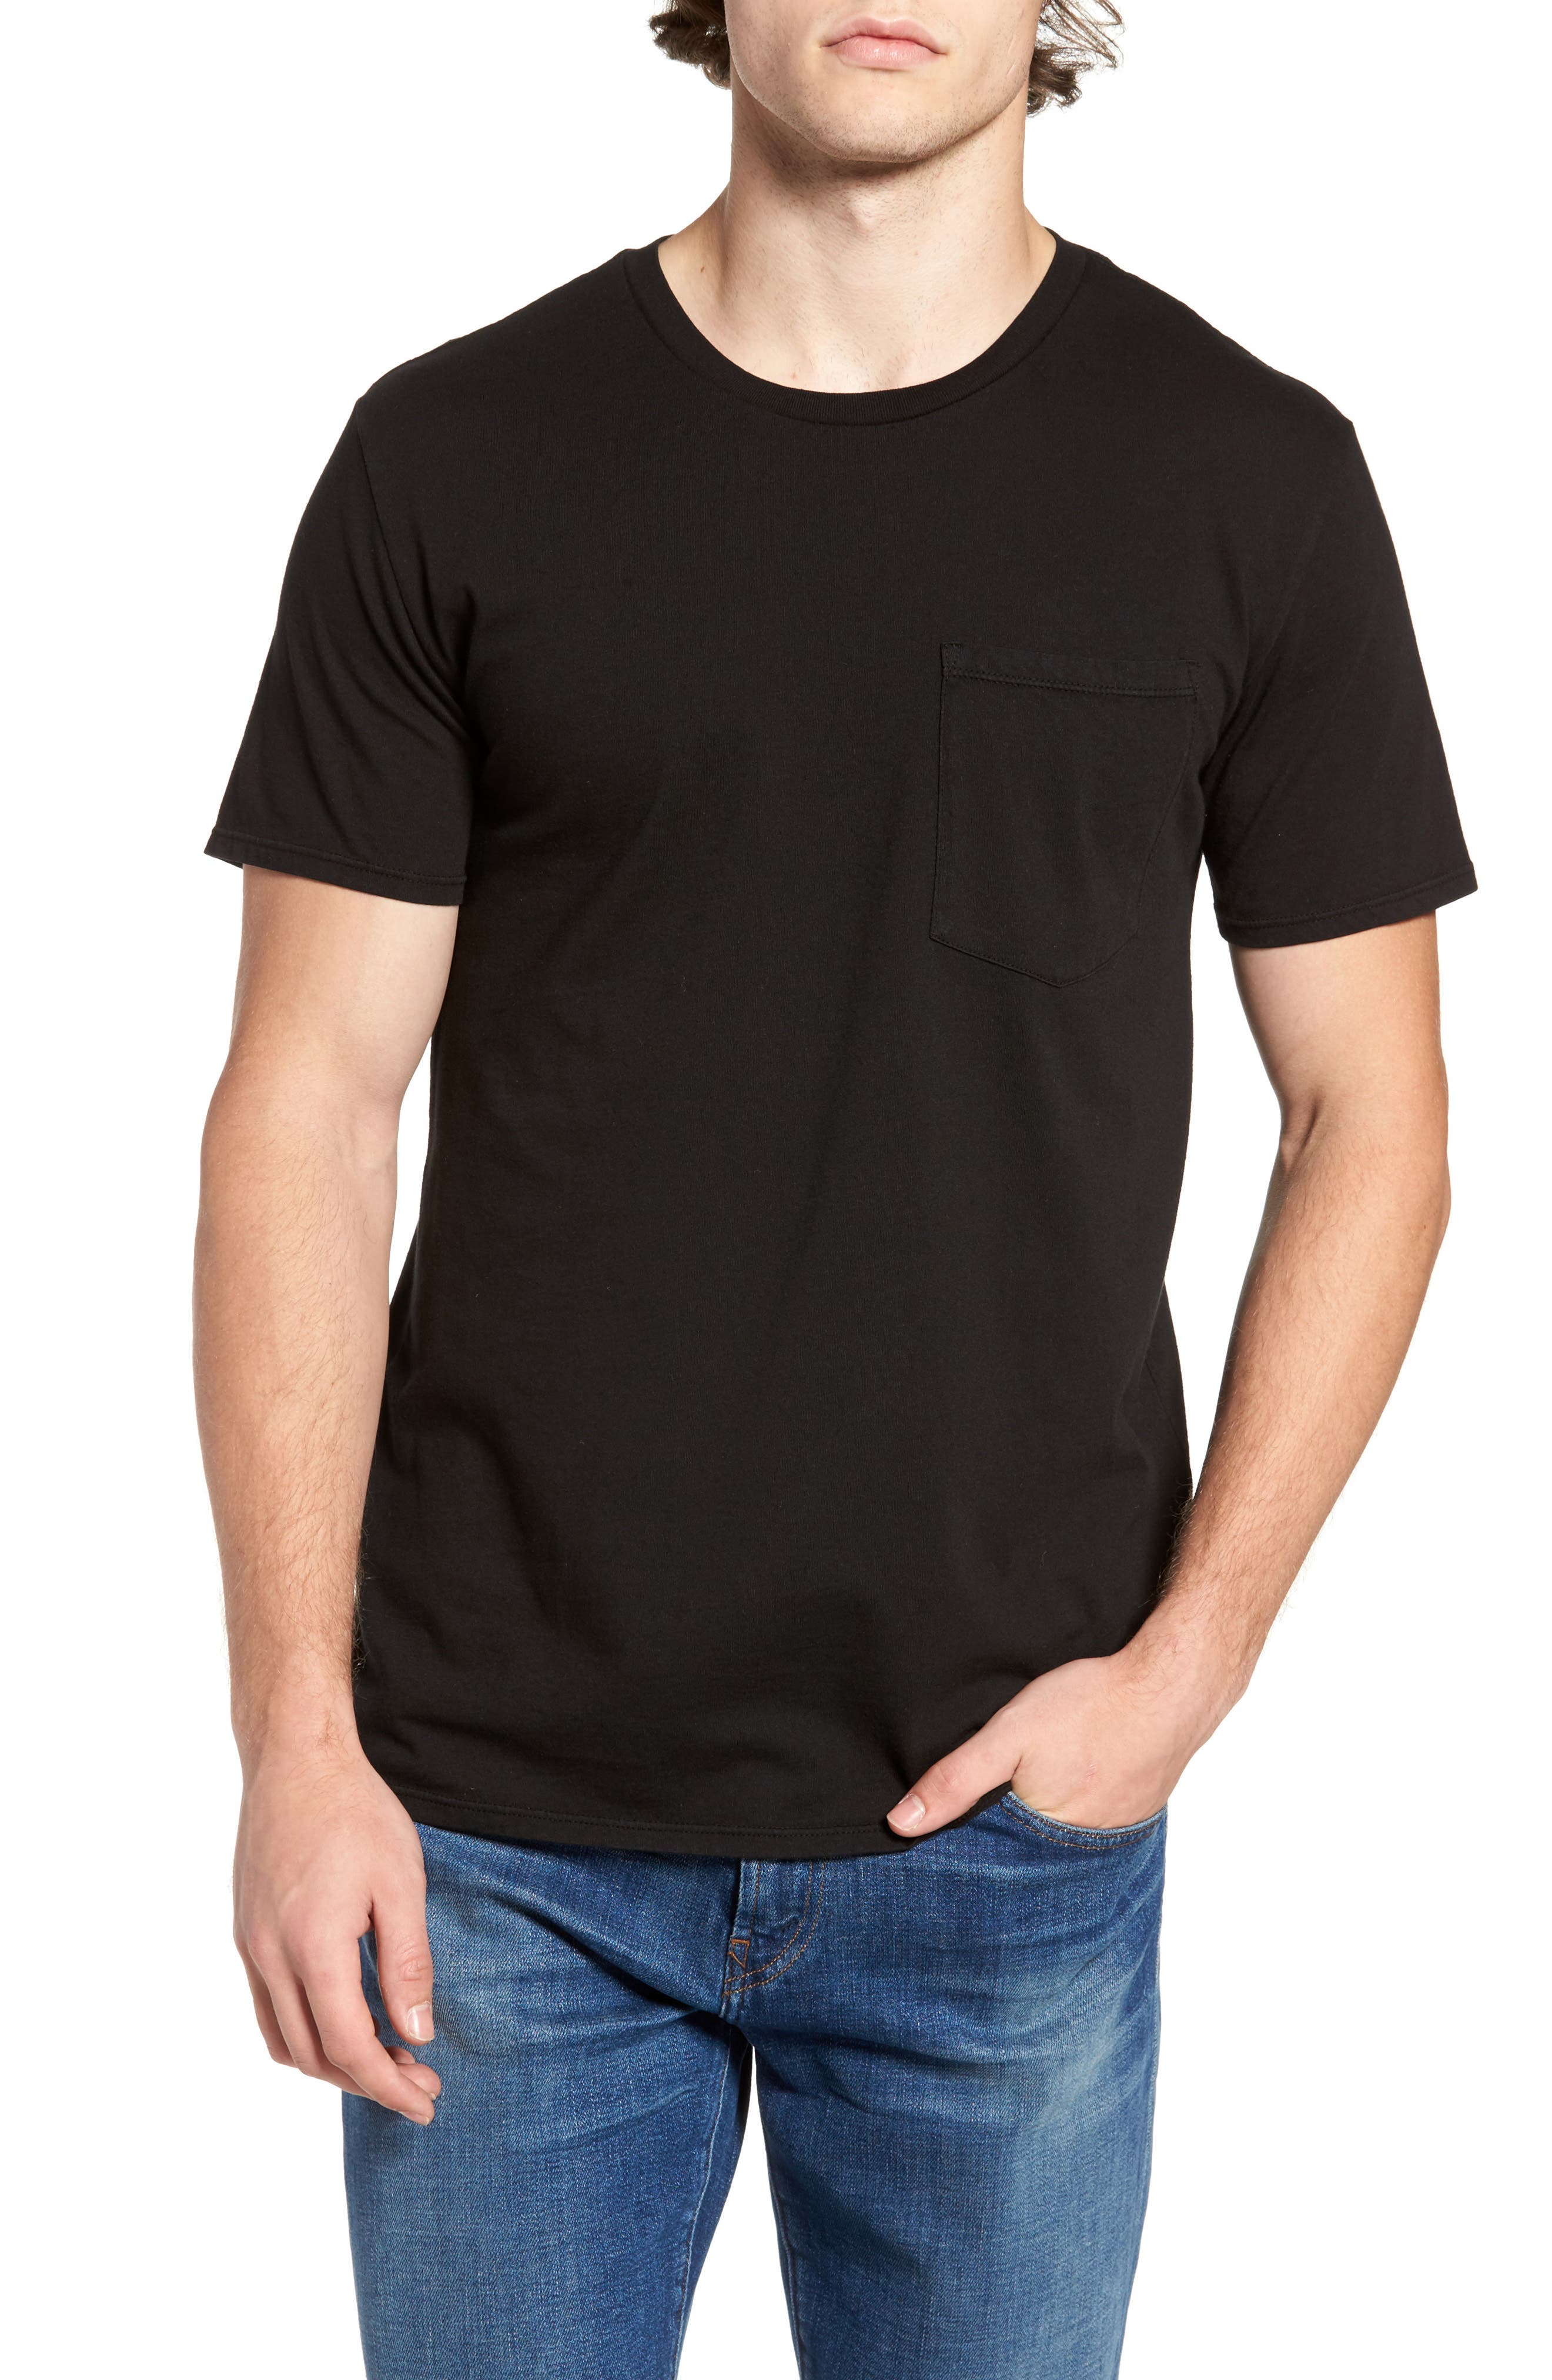 ORIGINAL PAPERBACKS,                             Pocket T-Shirt,                             Main thumbnail 1, color,                             001